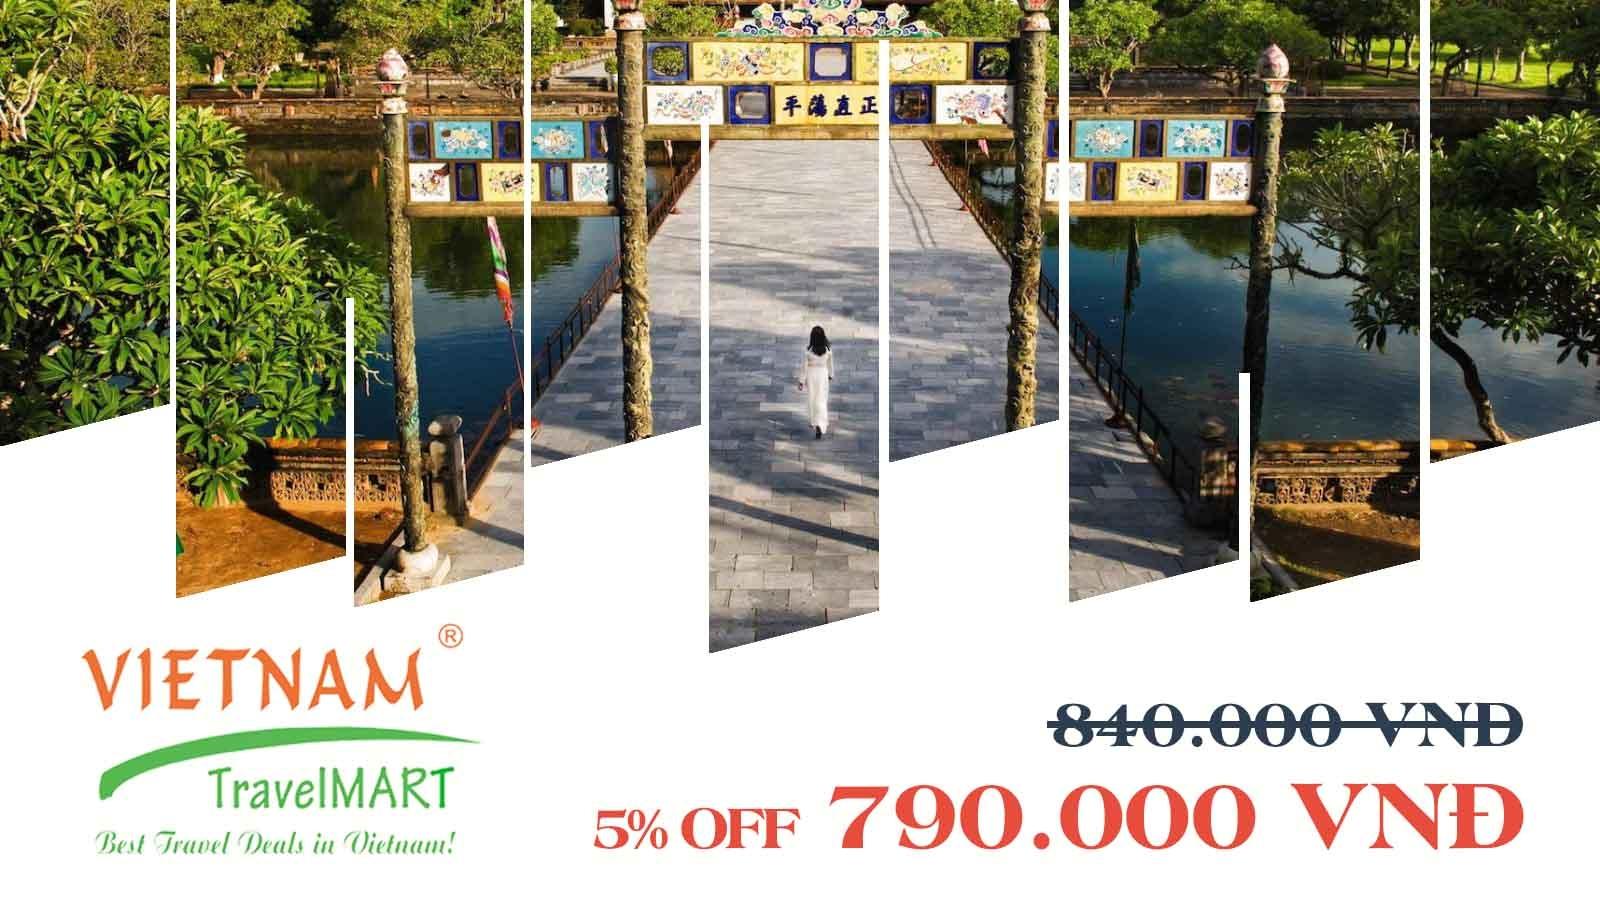 VIETNAM TRAVELMART JSC | 5% OFF HUE CITY TOUR  IMPERIAL CITADEL- KHAI DINH TOMB - THIEN MU PAGODA